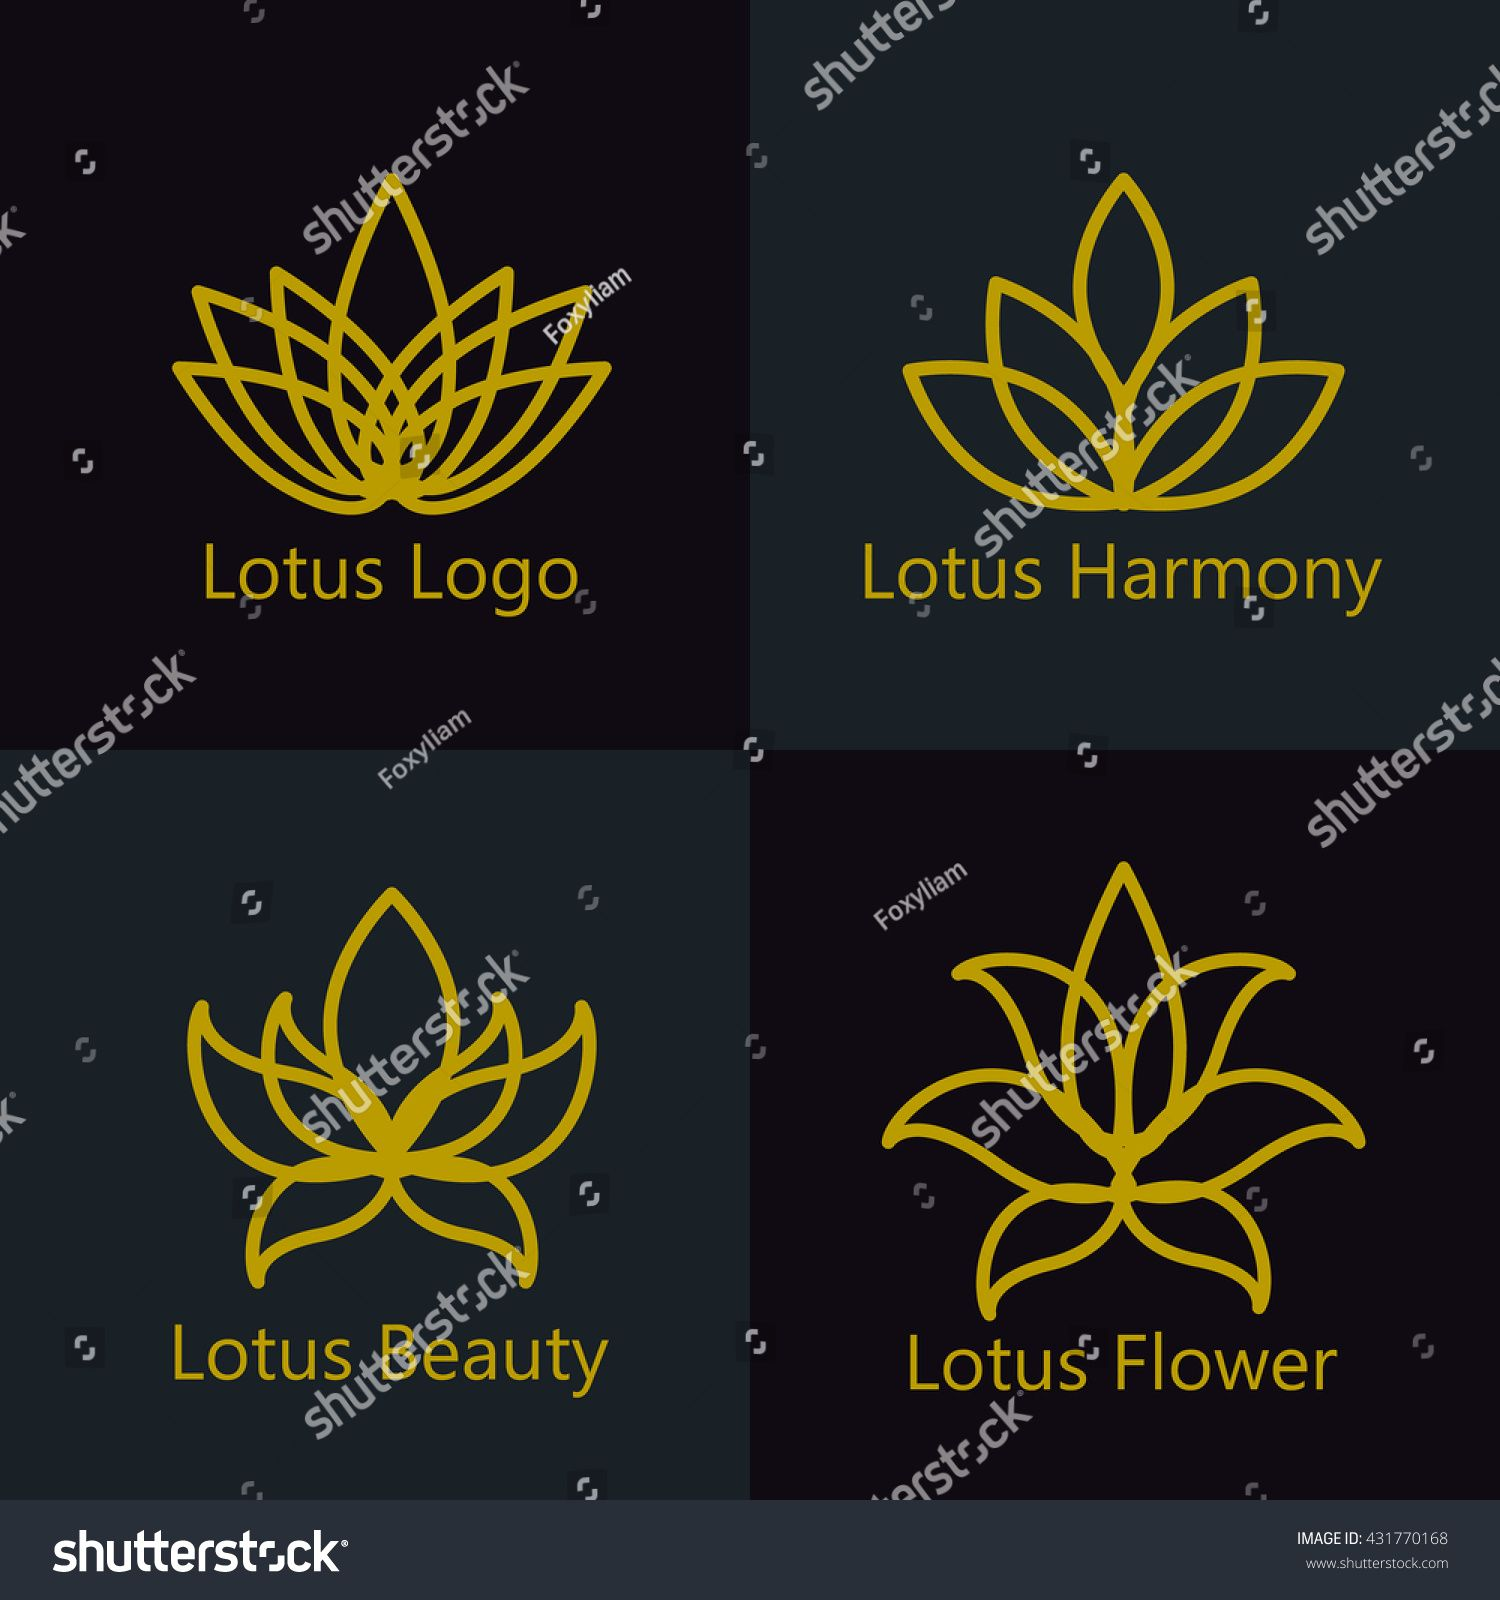 Lotus flower logo assorted icons set. Vector illustration